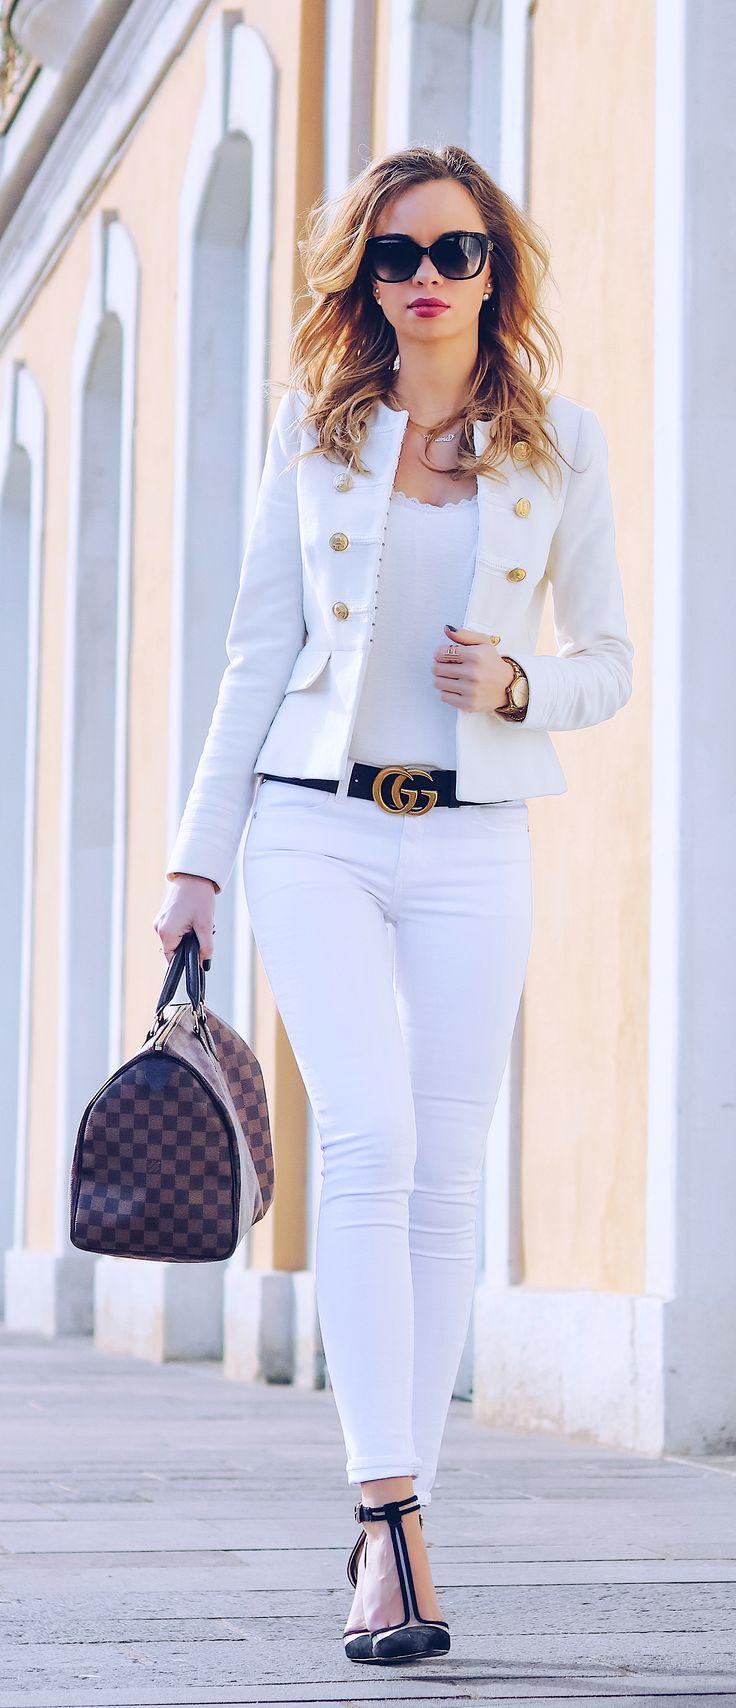 Royal Vanilla – My Philocaly | Fashion & Lifestyle Blog